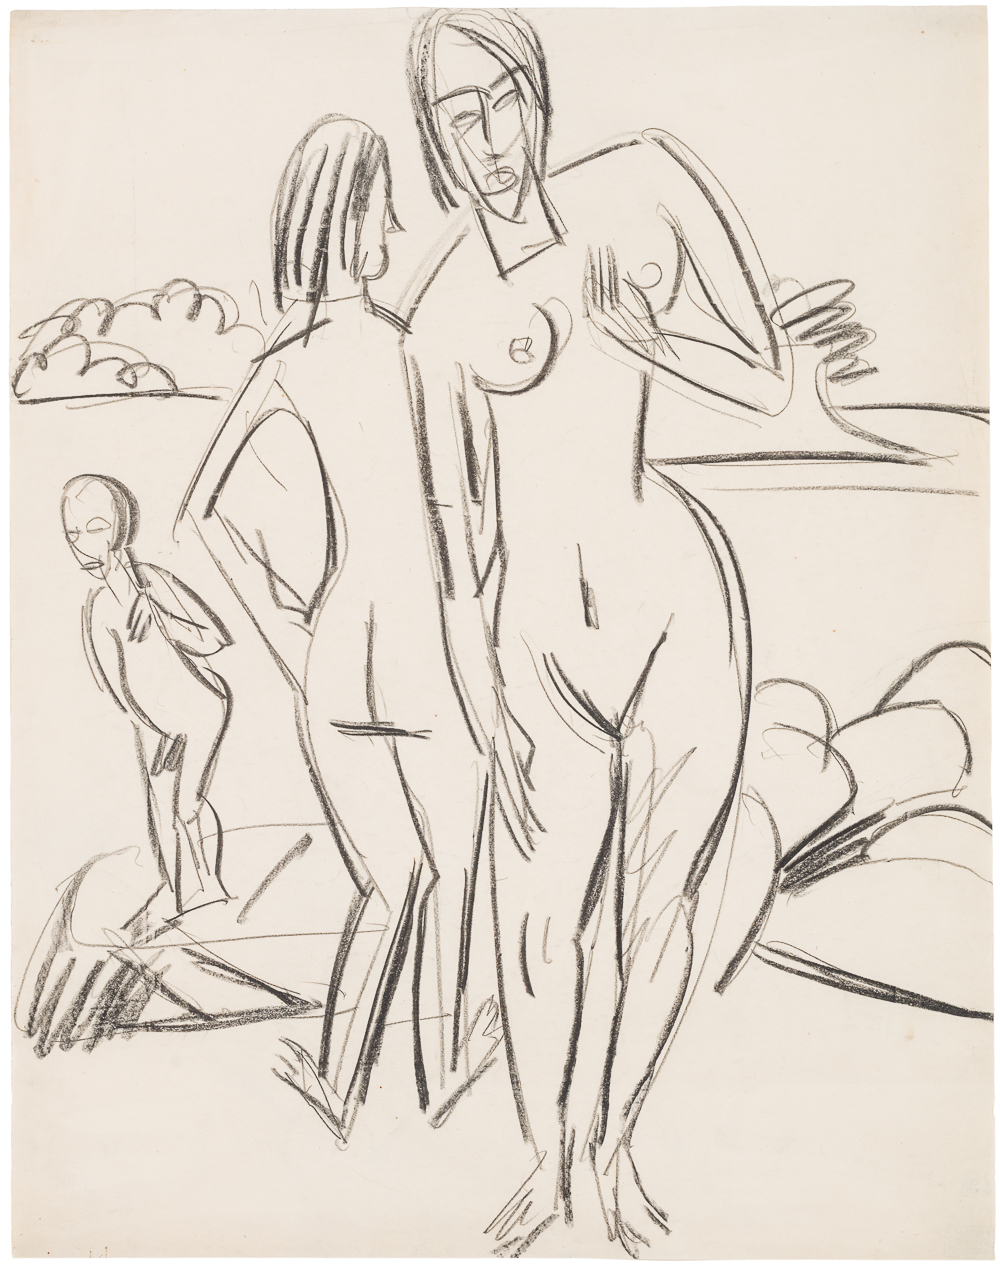 Kirchner, Ernst Ludwig - Akte am Fehmarnstrand, 1912_web.jpg